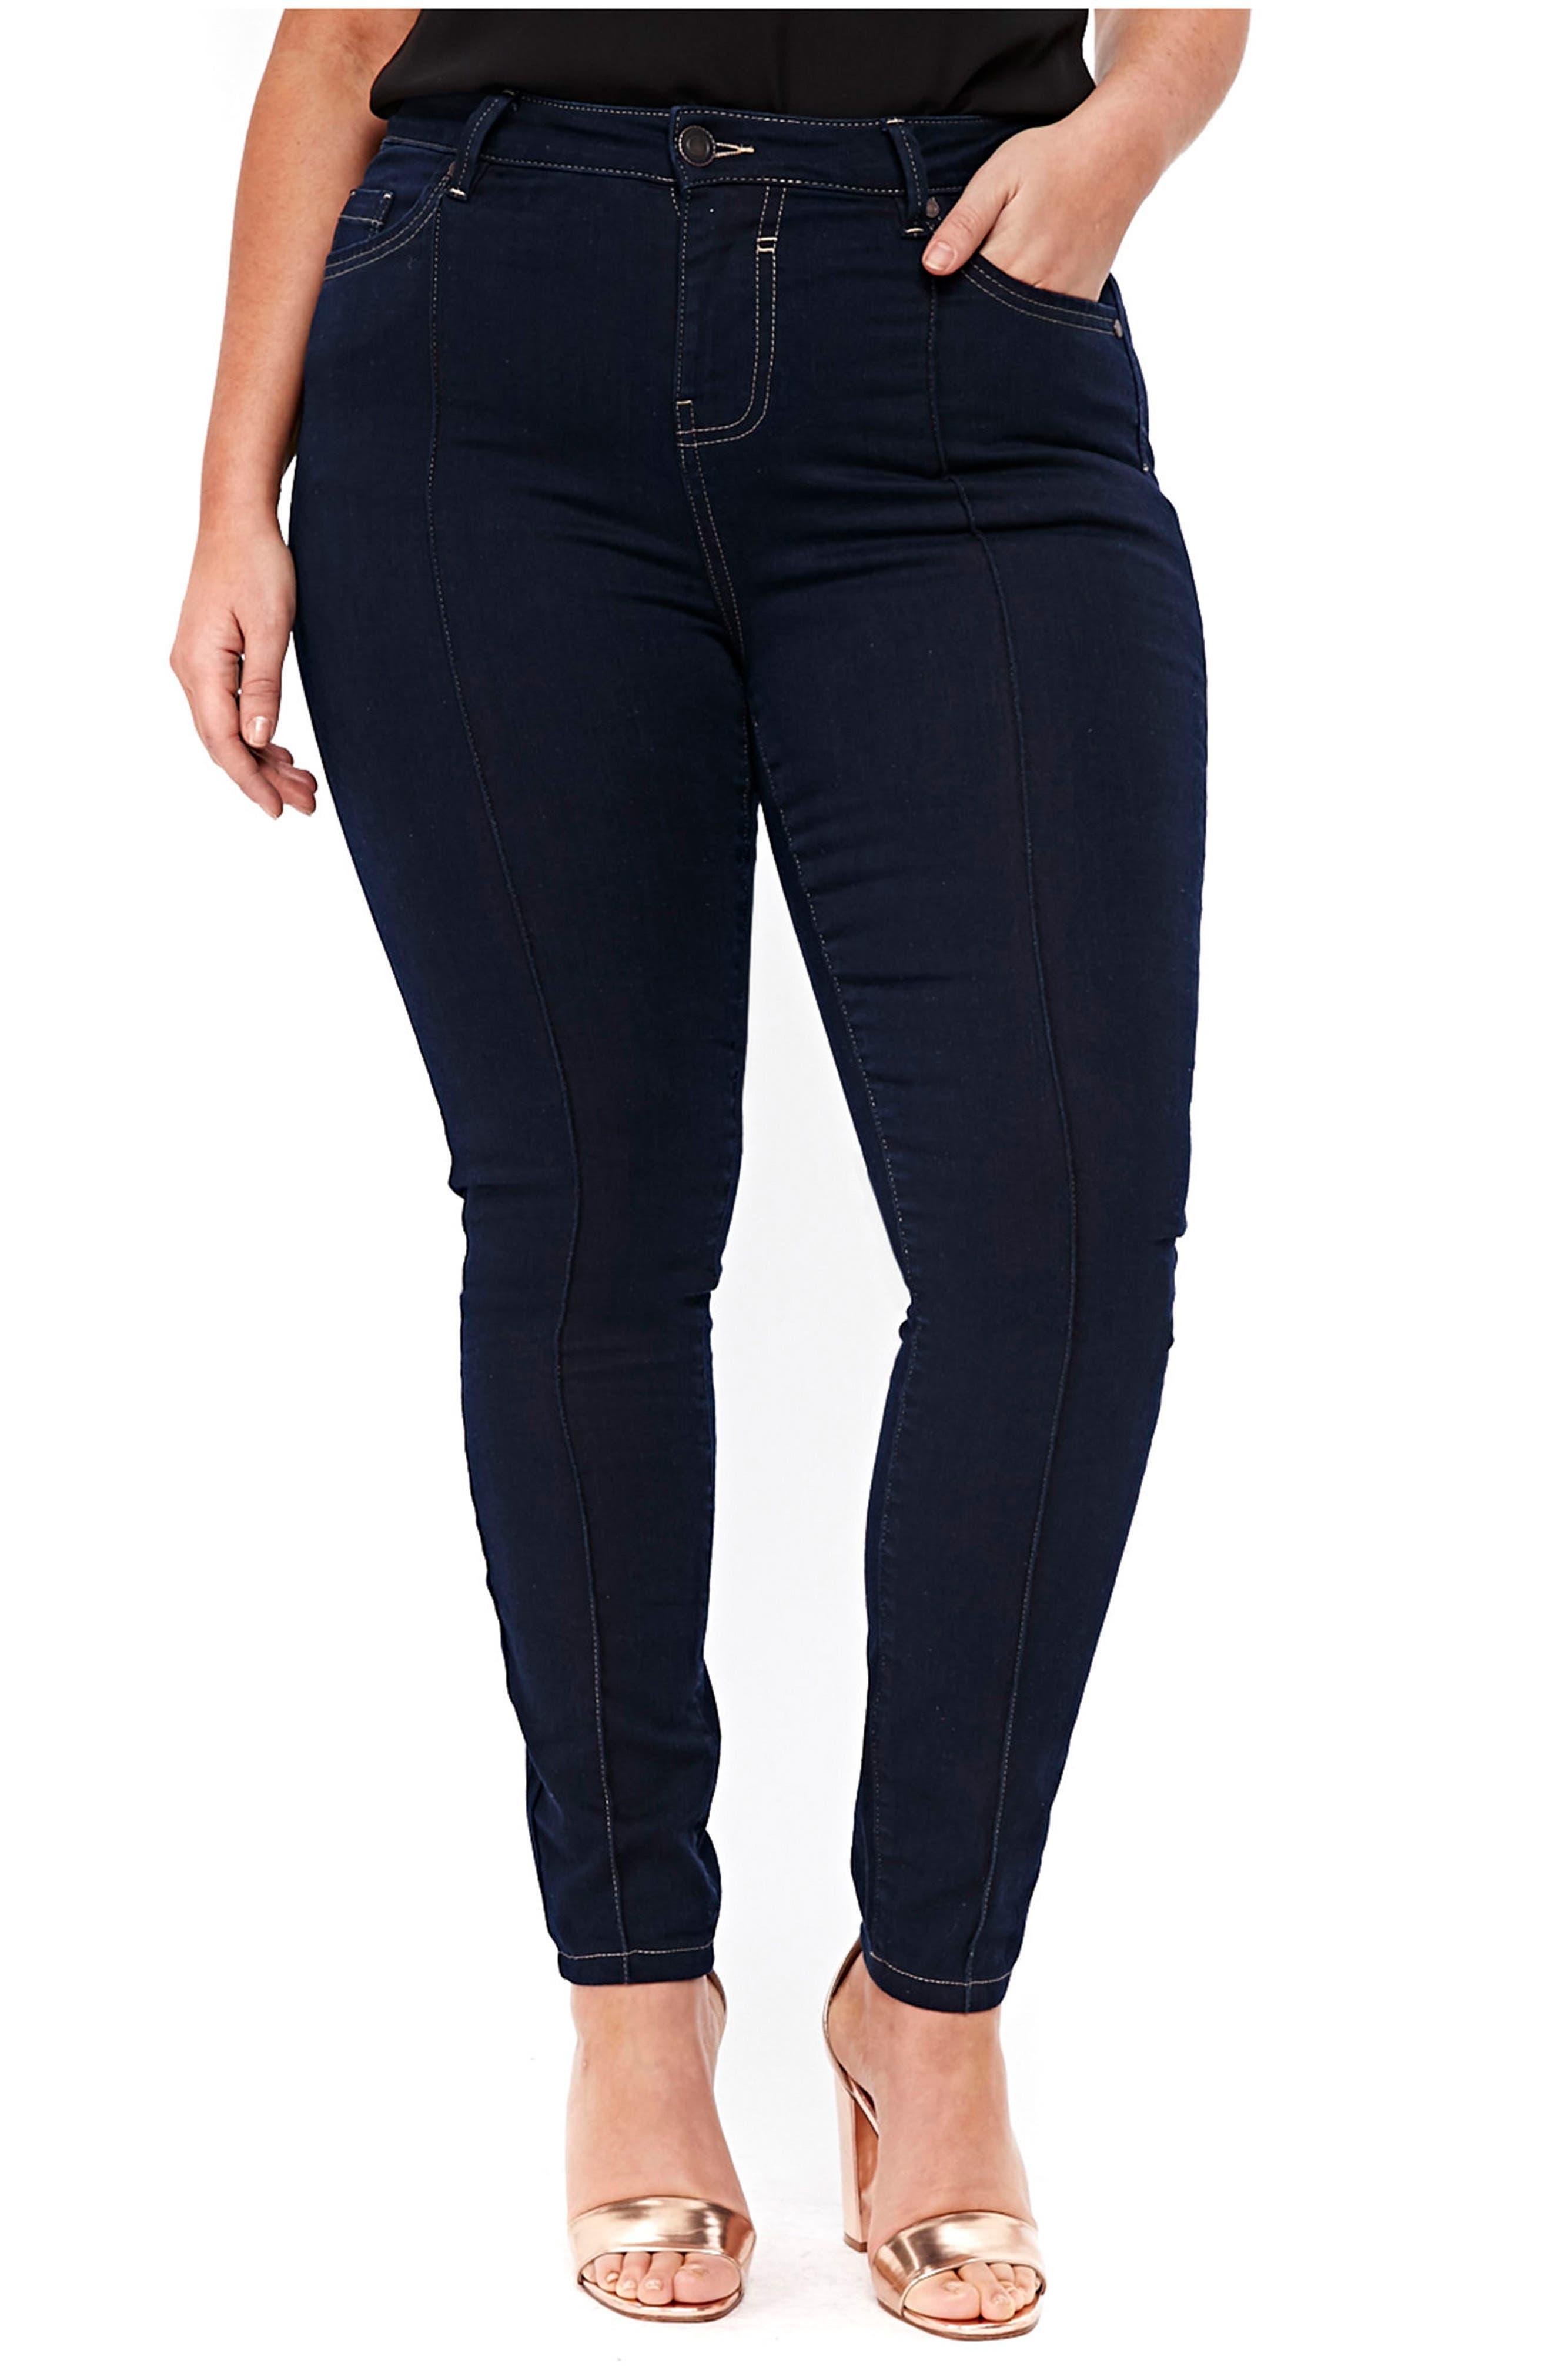 Pintuck High Waist Skinny Jeans,                             Main thumbnail 1, color,                             Indigo